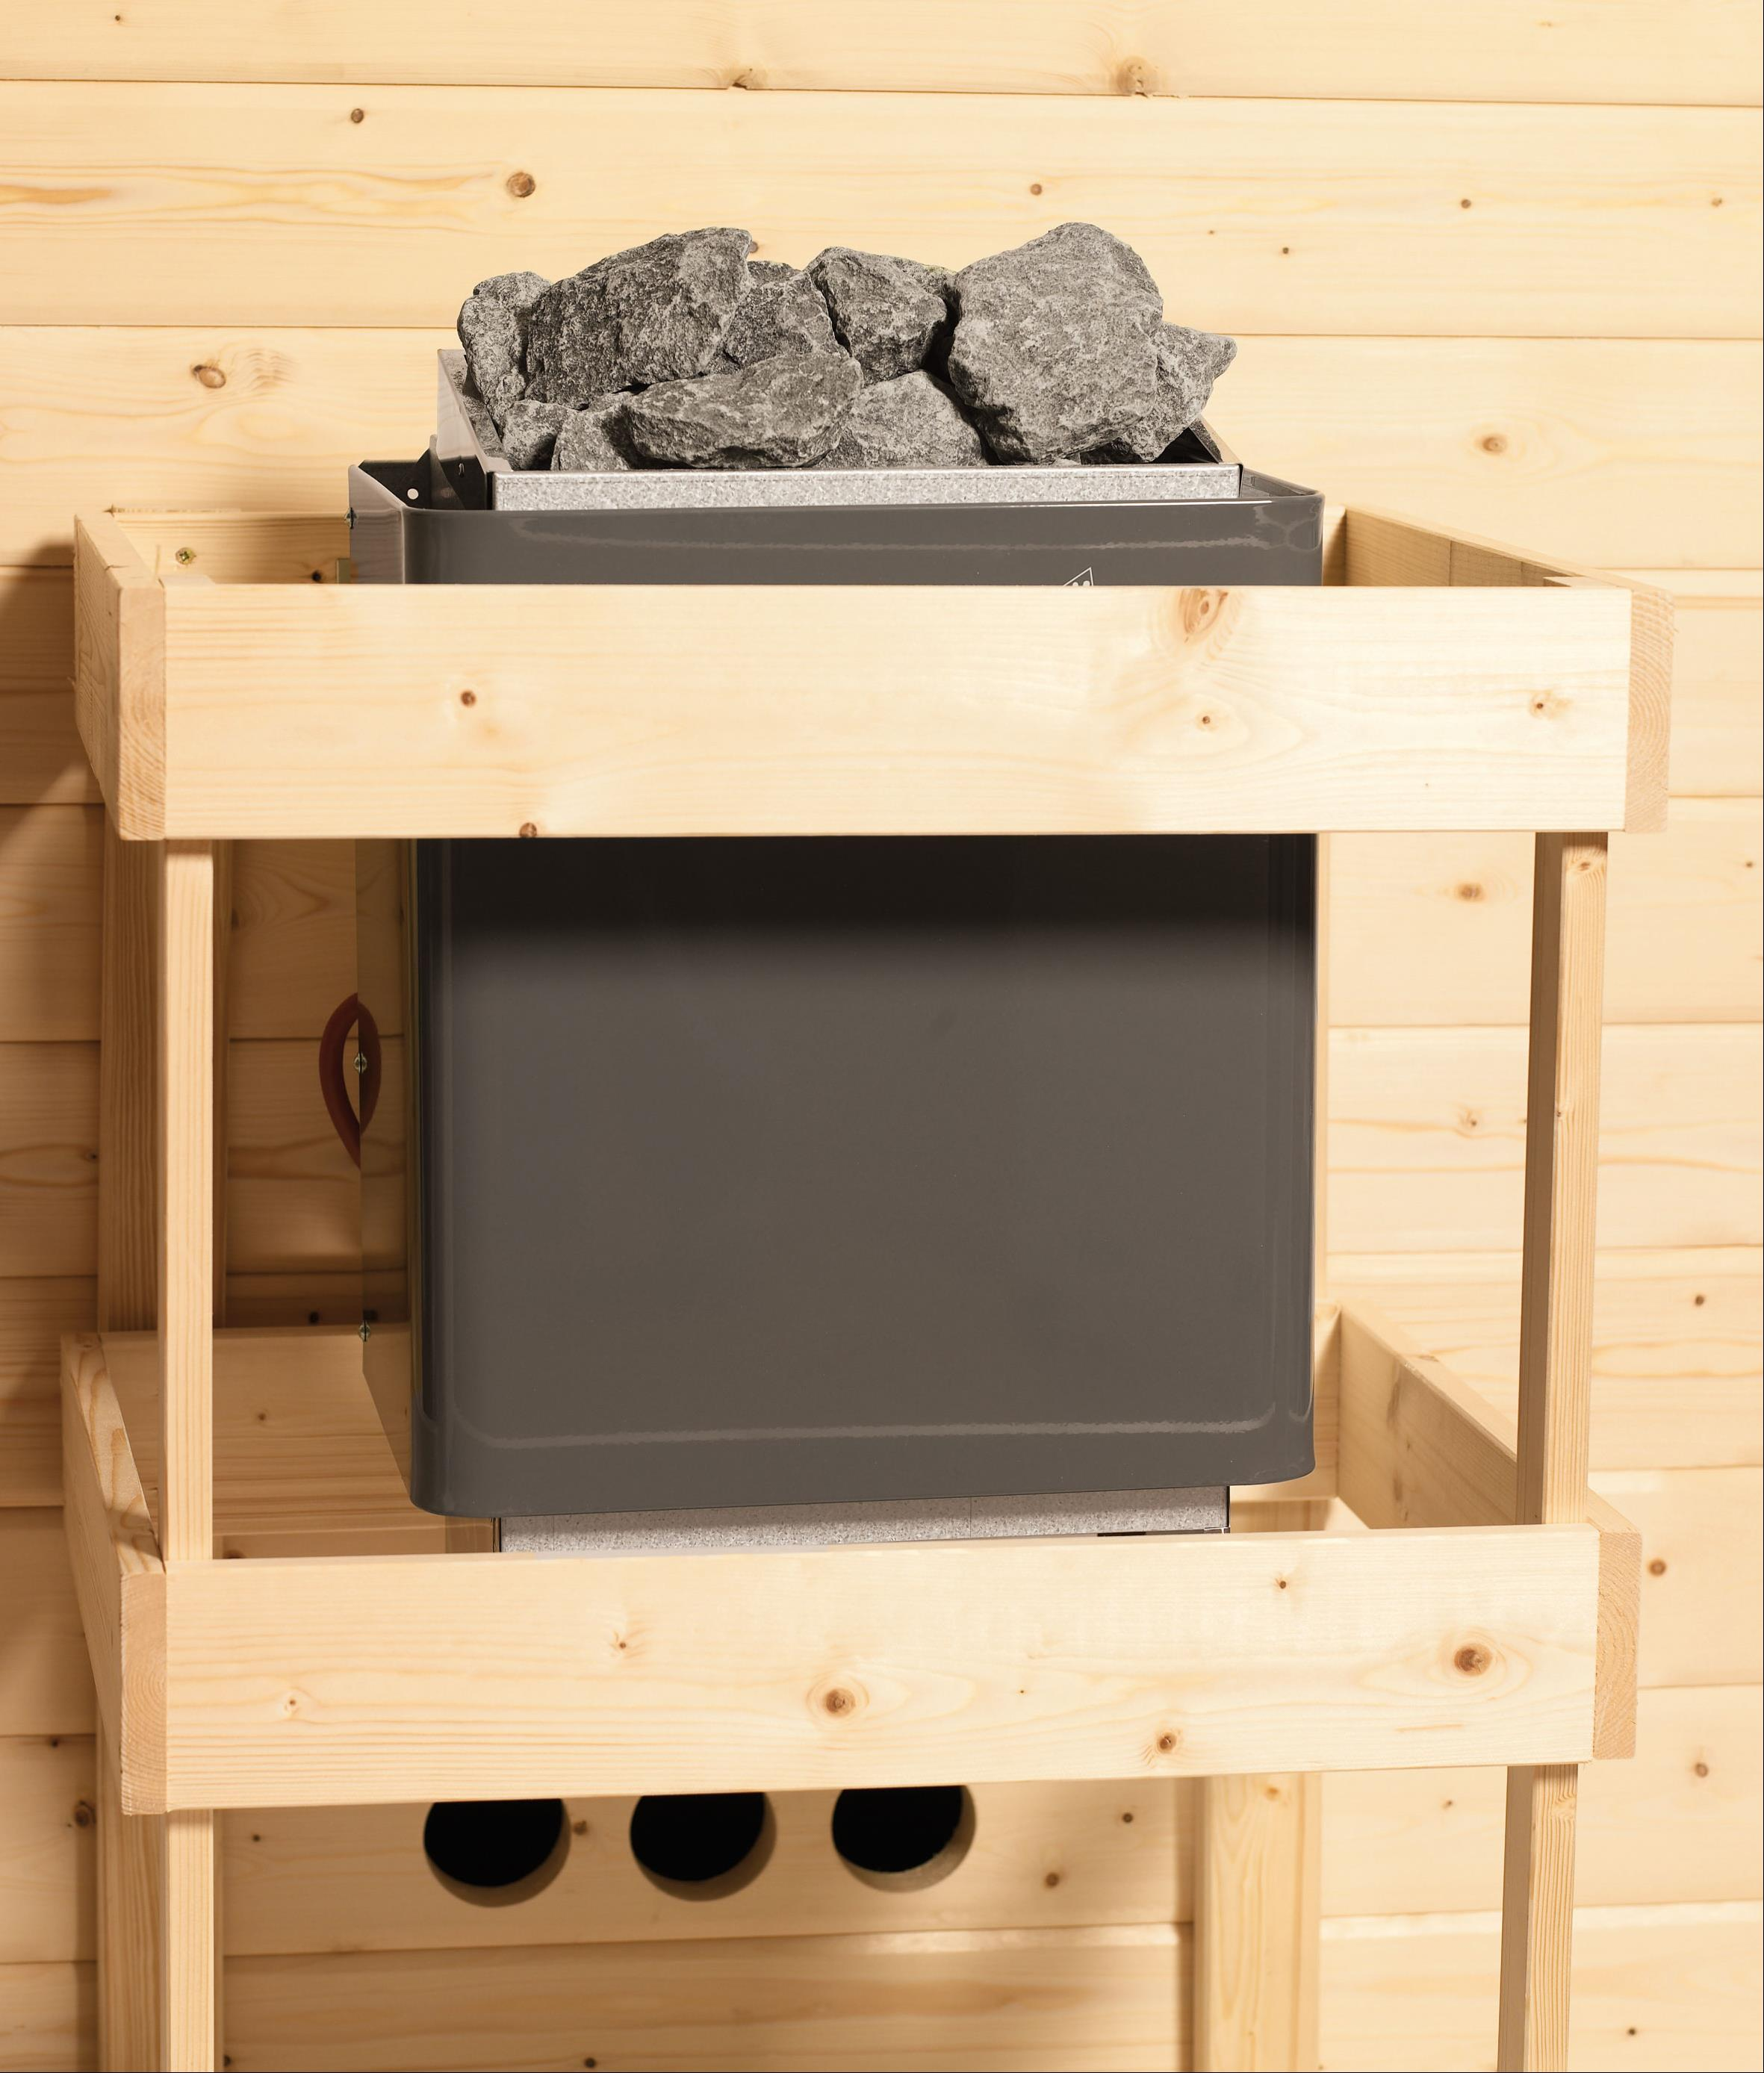 WoodFeeling Sauna Svea 38mm mit Saunaofen 9 kW extern Klarglas Tür Bild 9